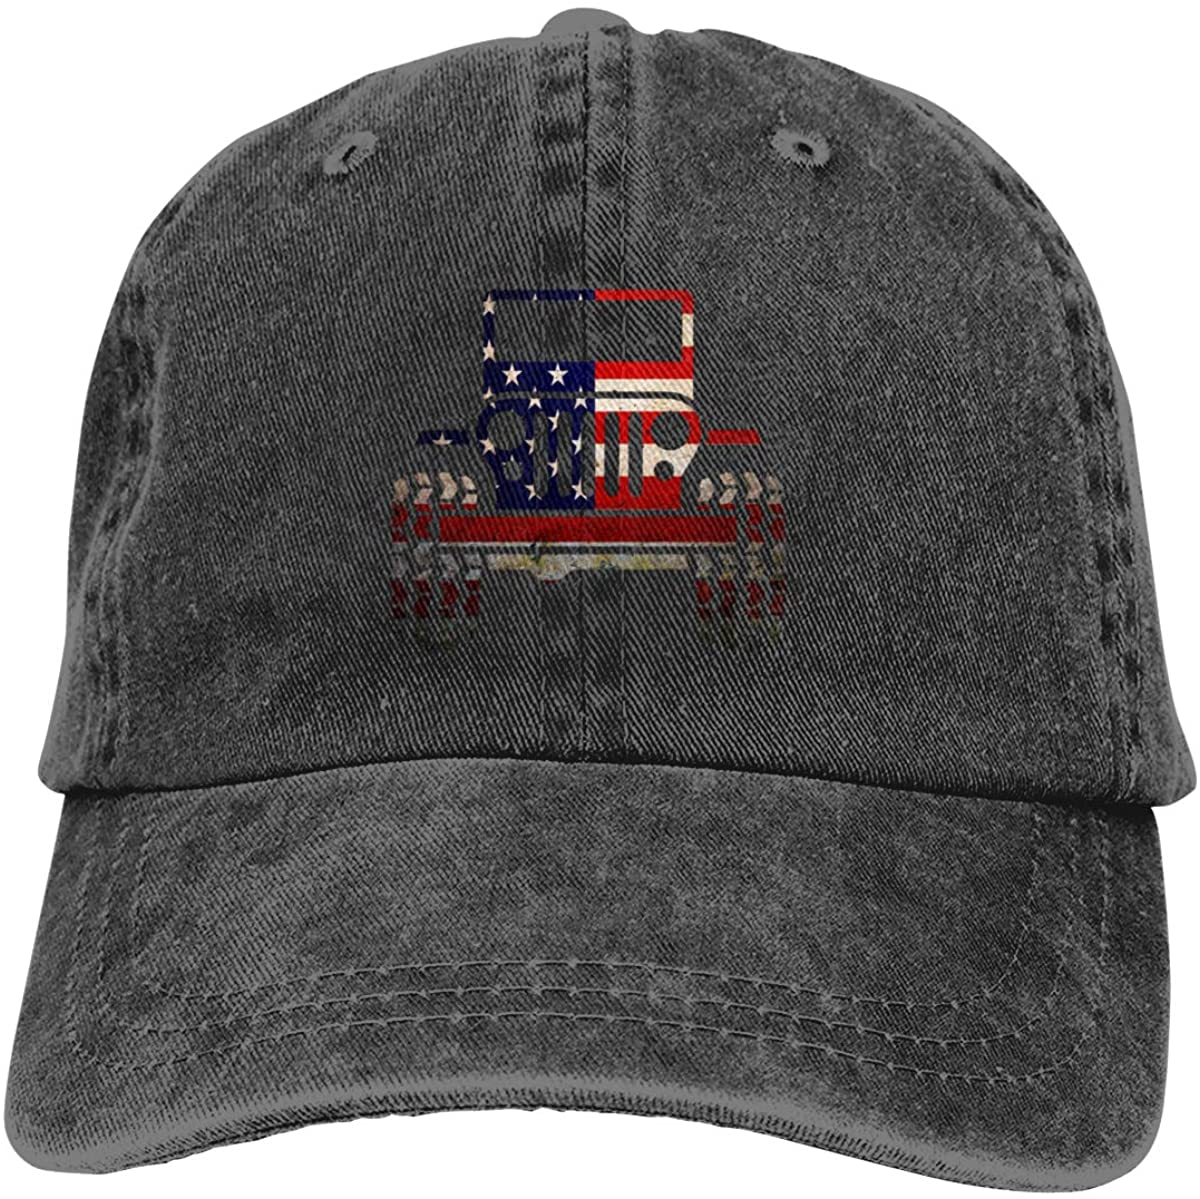 American Flag Car Dad Vintage Baseball Cap Denim Hats Adjustable Men